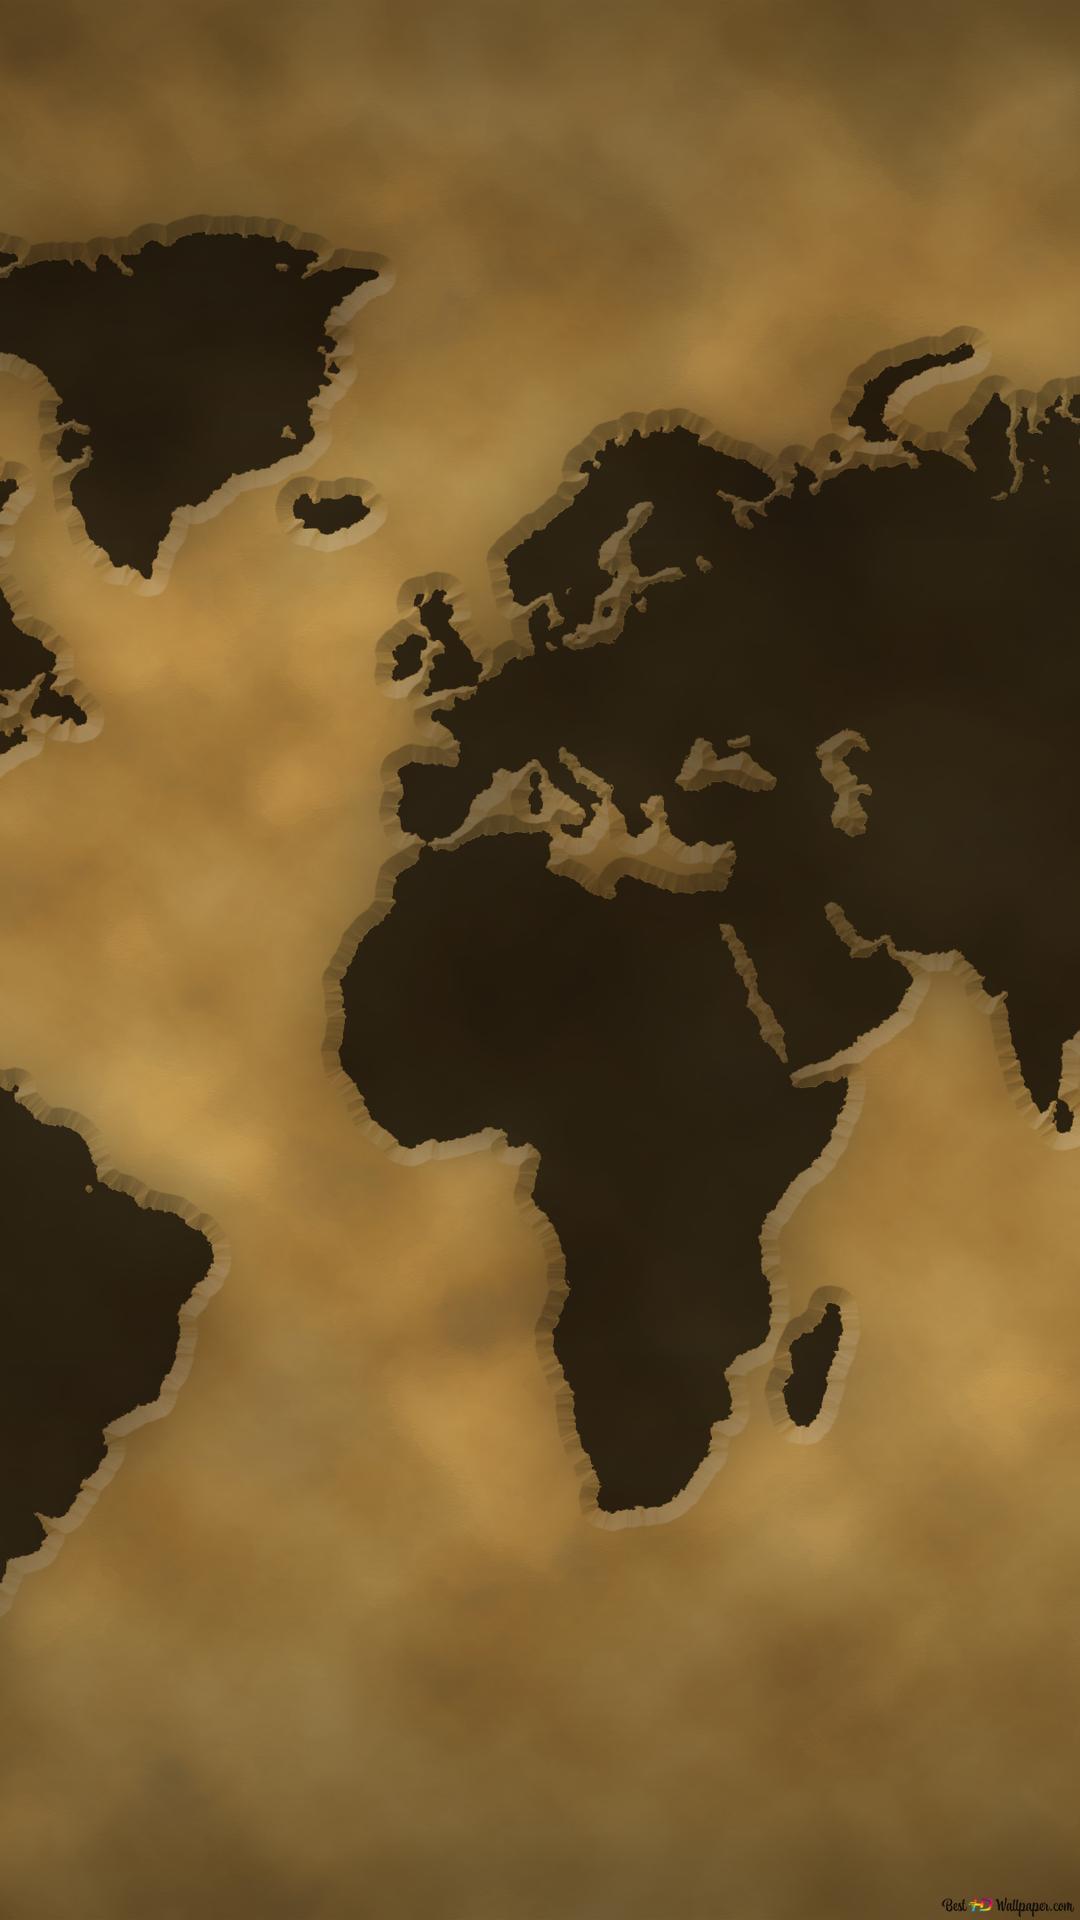 Grunge World Map Hd Wallpaper Download